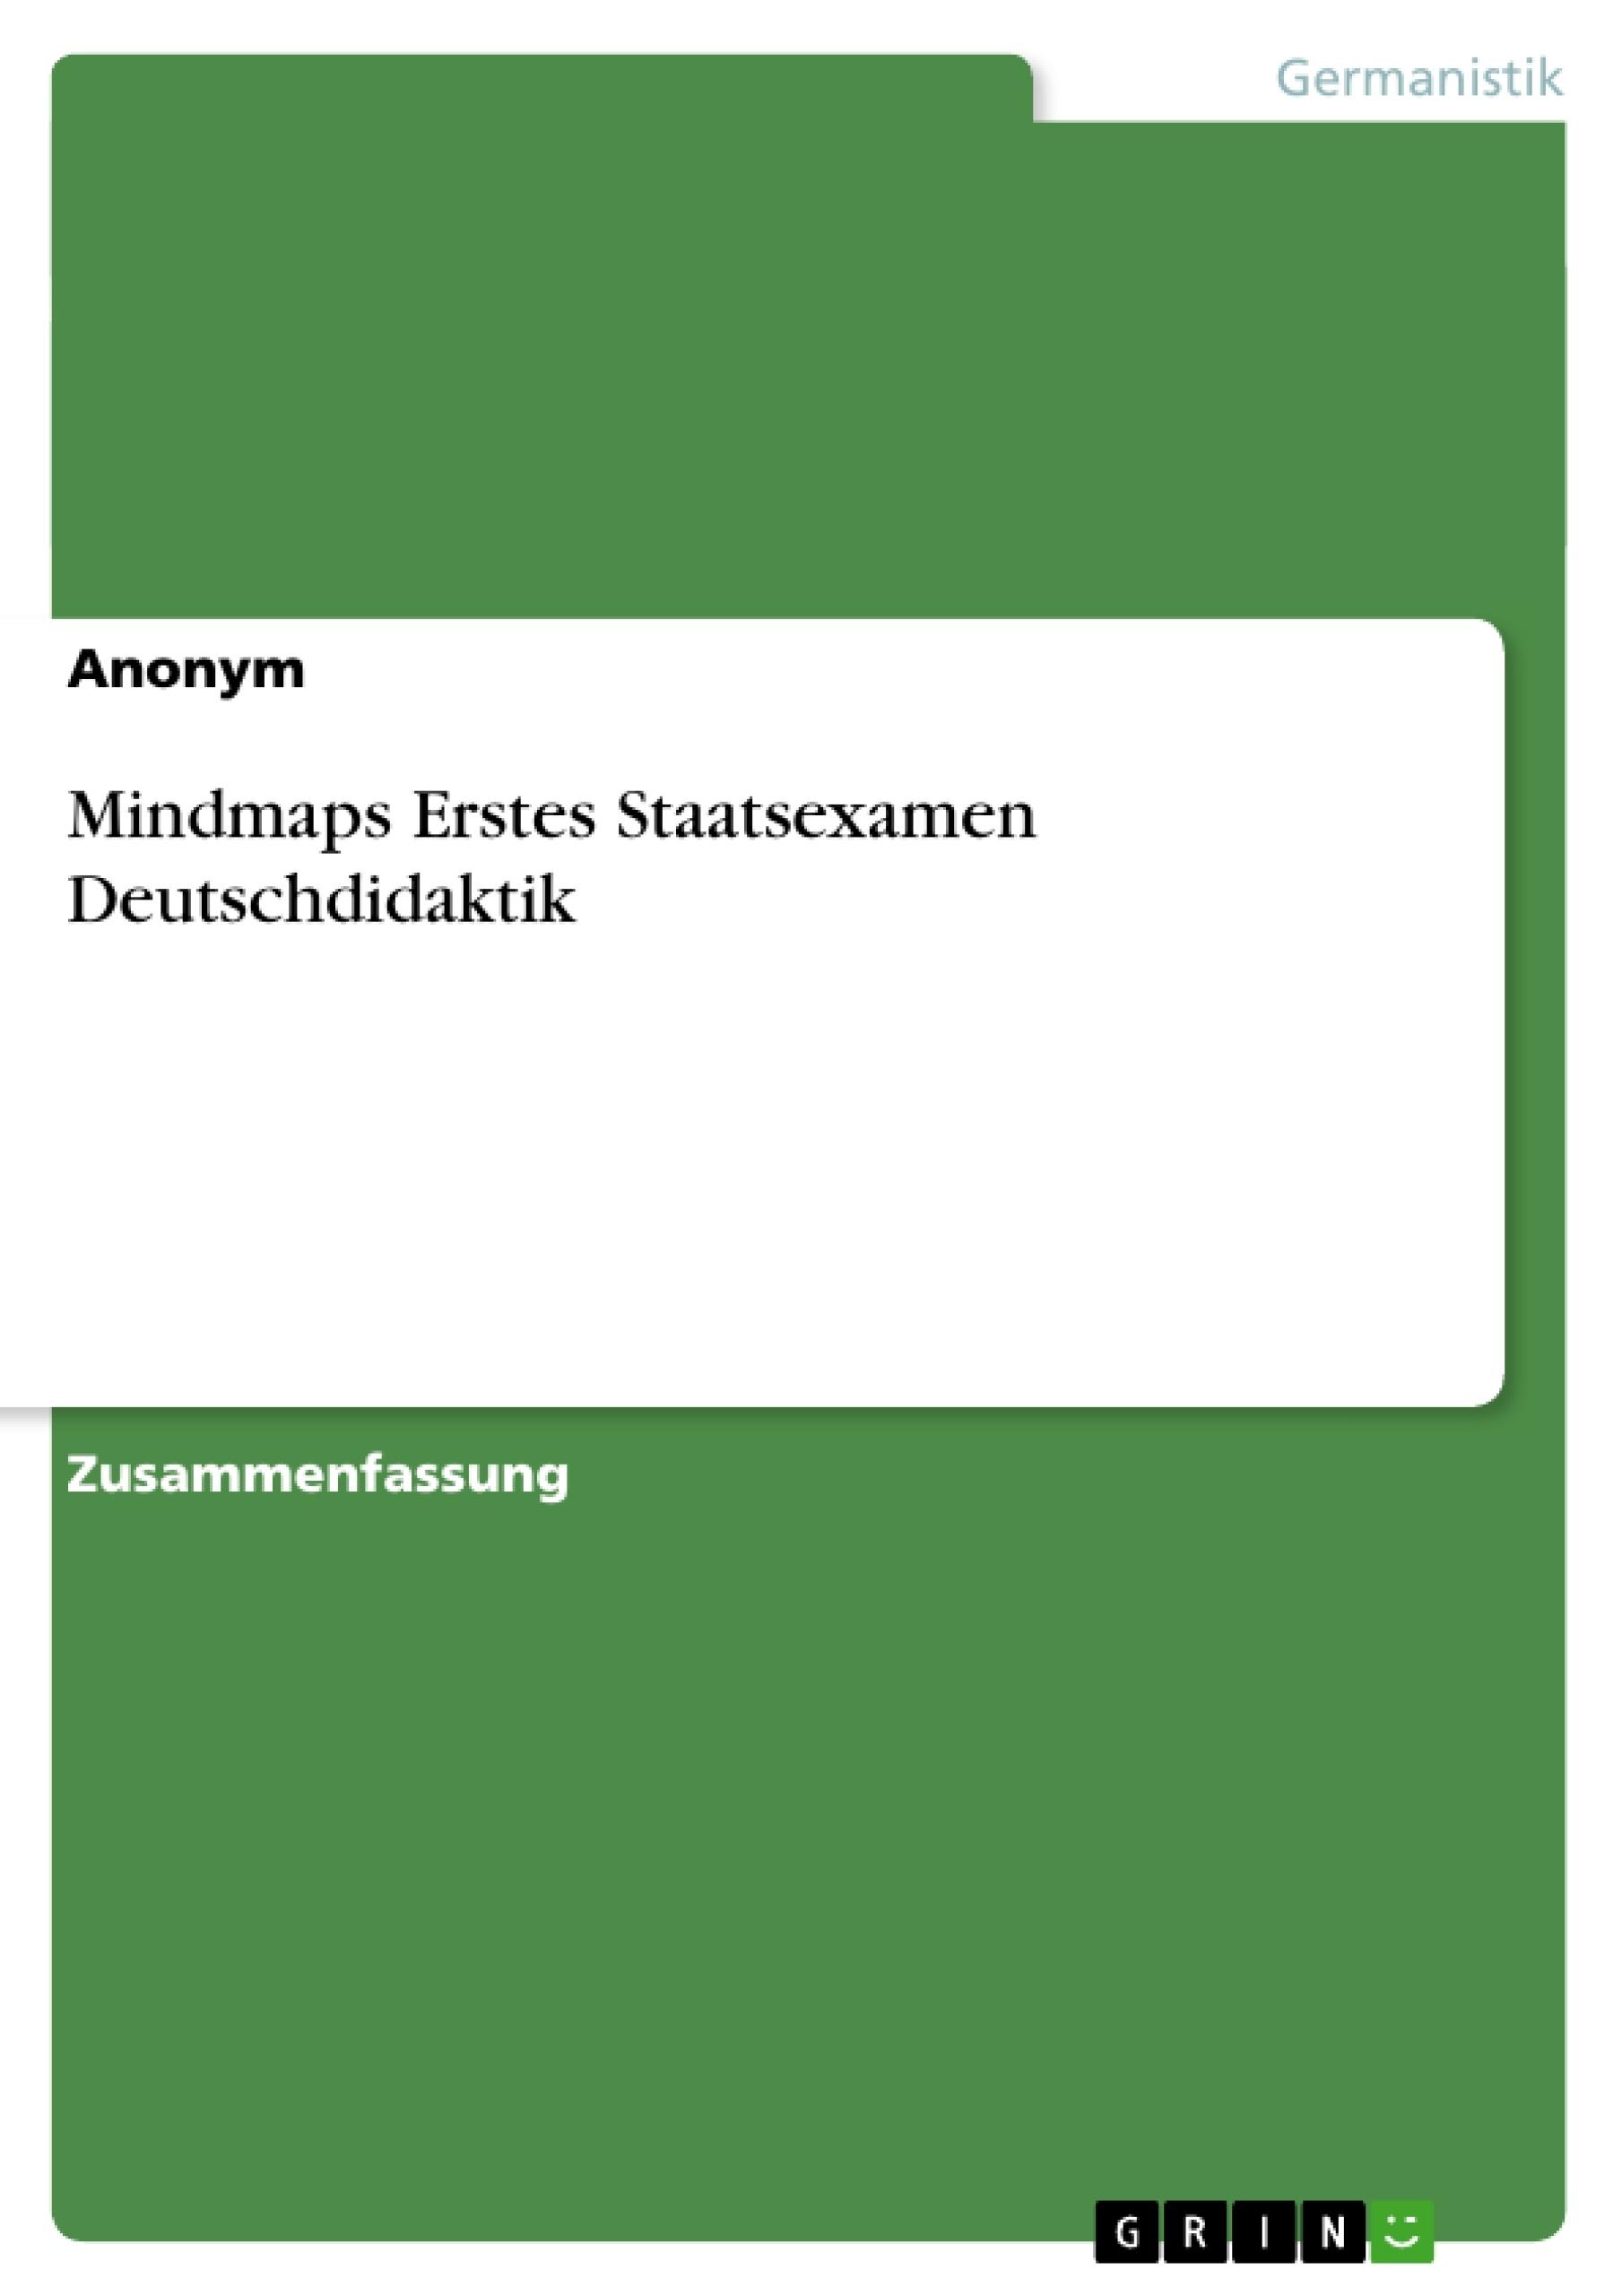 Titel: Mindmaps Erstes Staatsexamen Deutschdidaktik